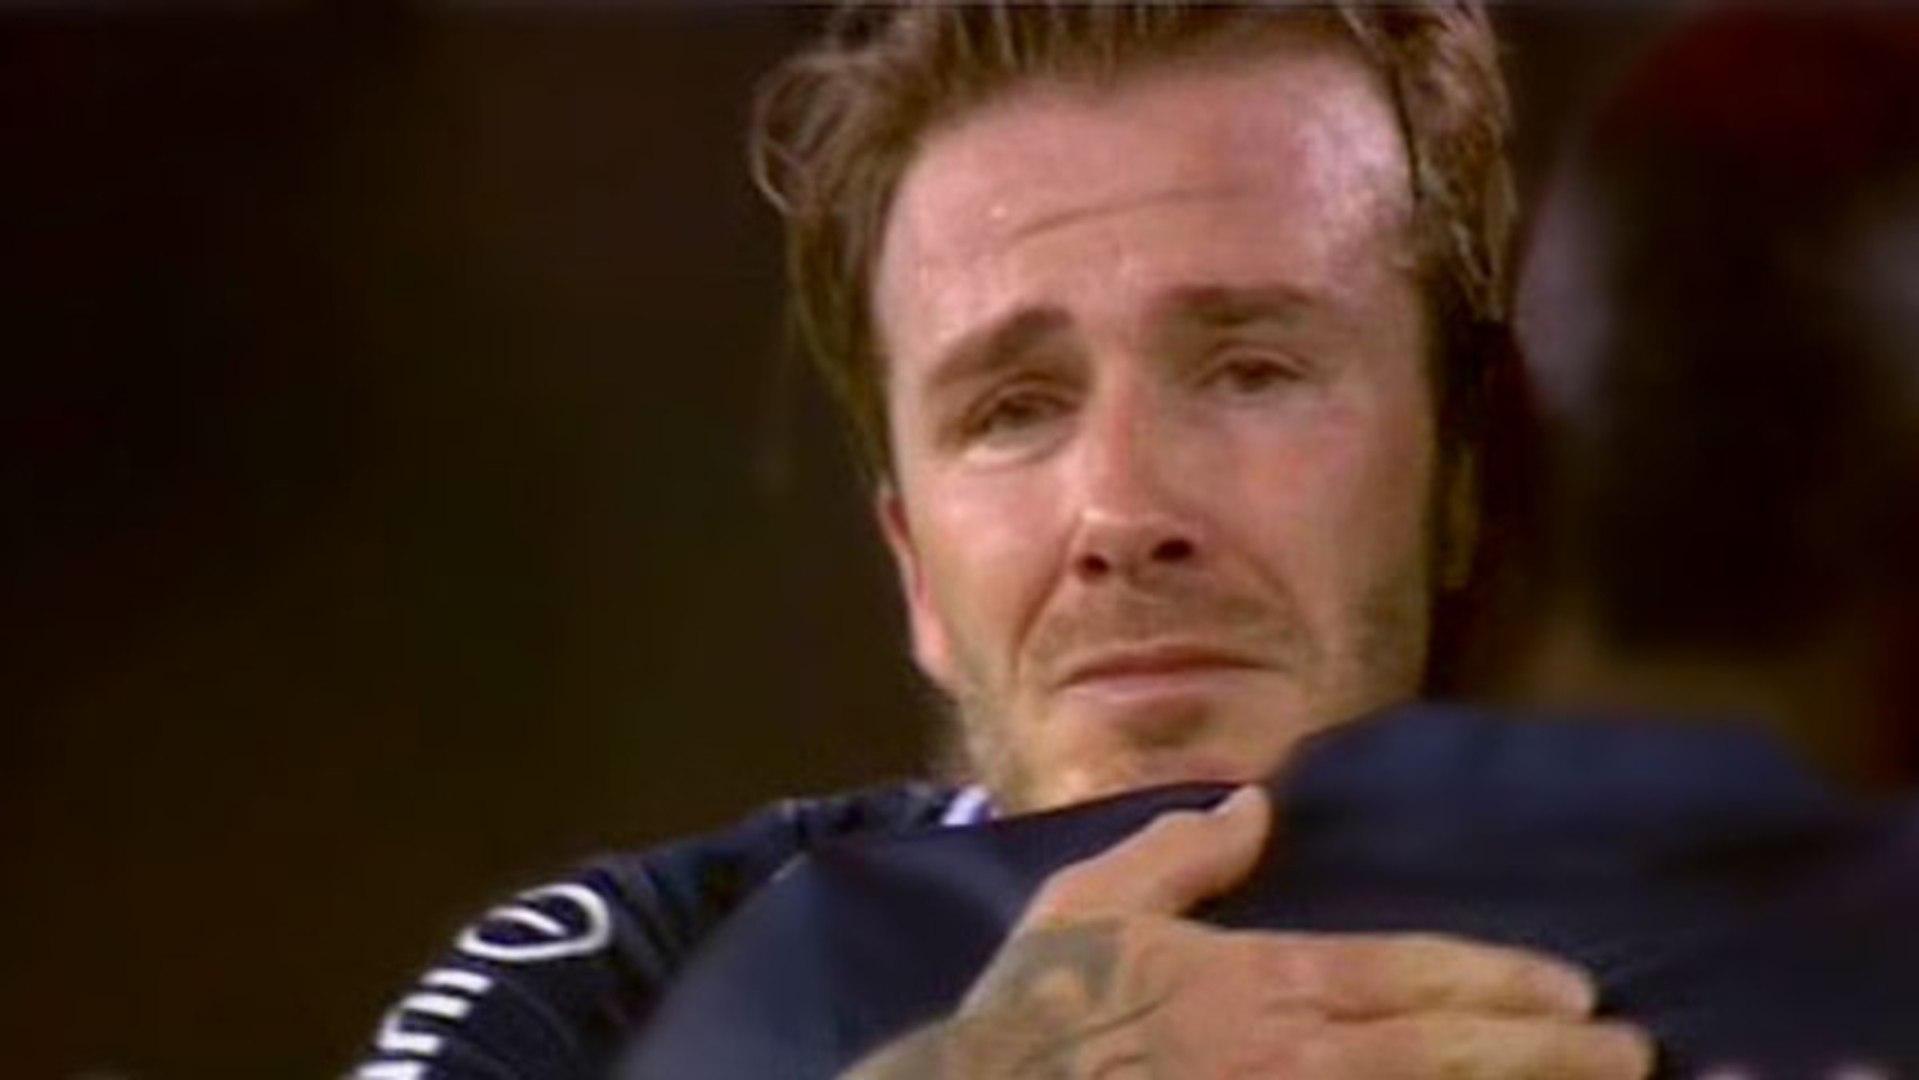 David Beckham Forced To MASTURBATE PUBLICLY!